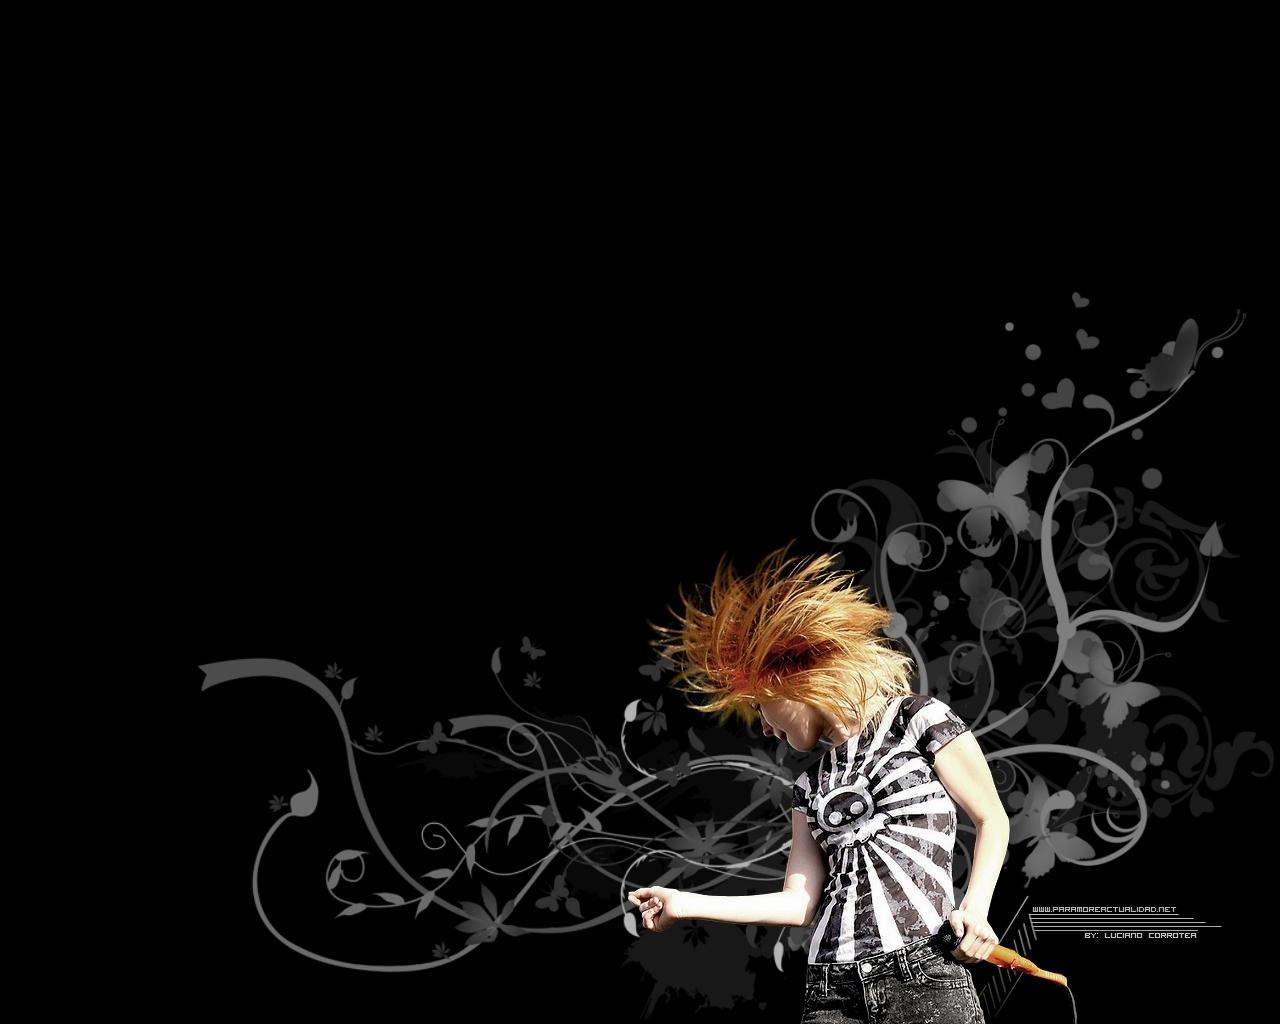 Paramore: Hayley Williams (Wallpaper) - Paramore Wallpaper (11110226 ...